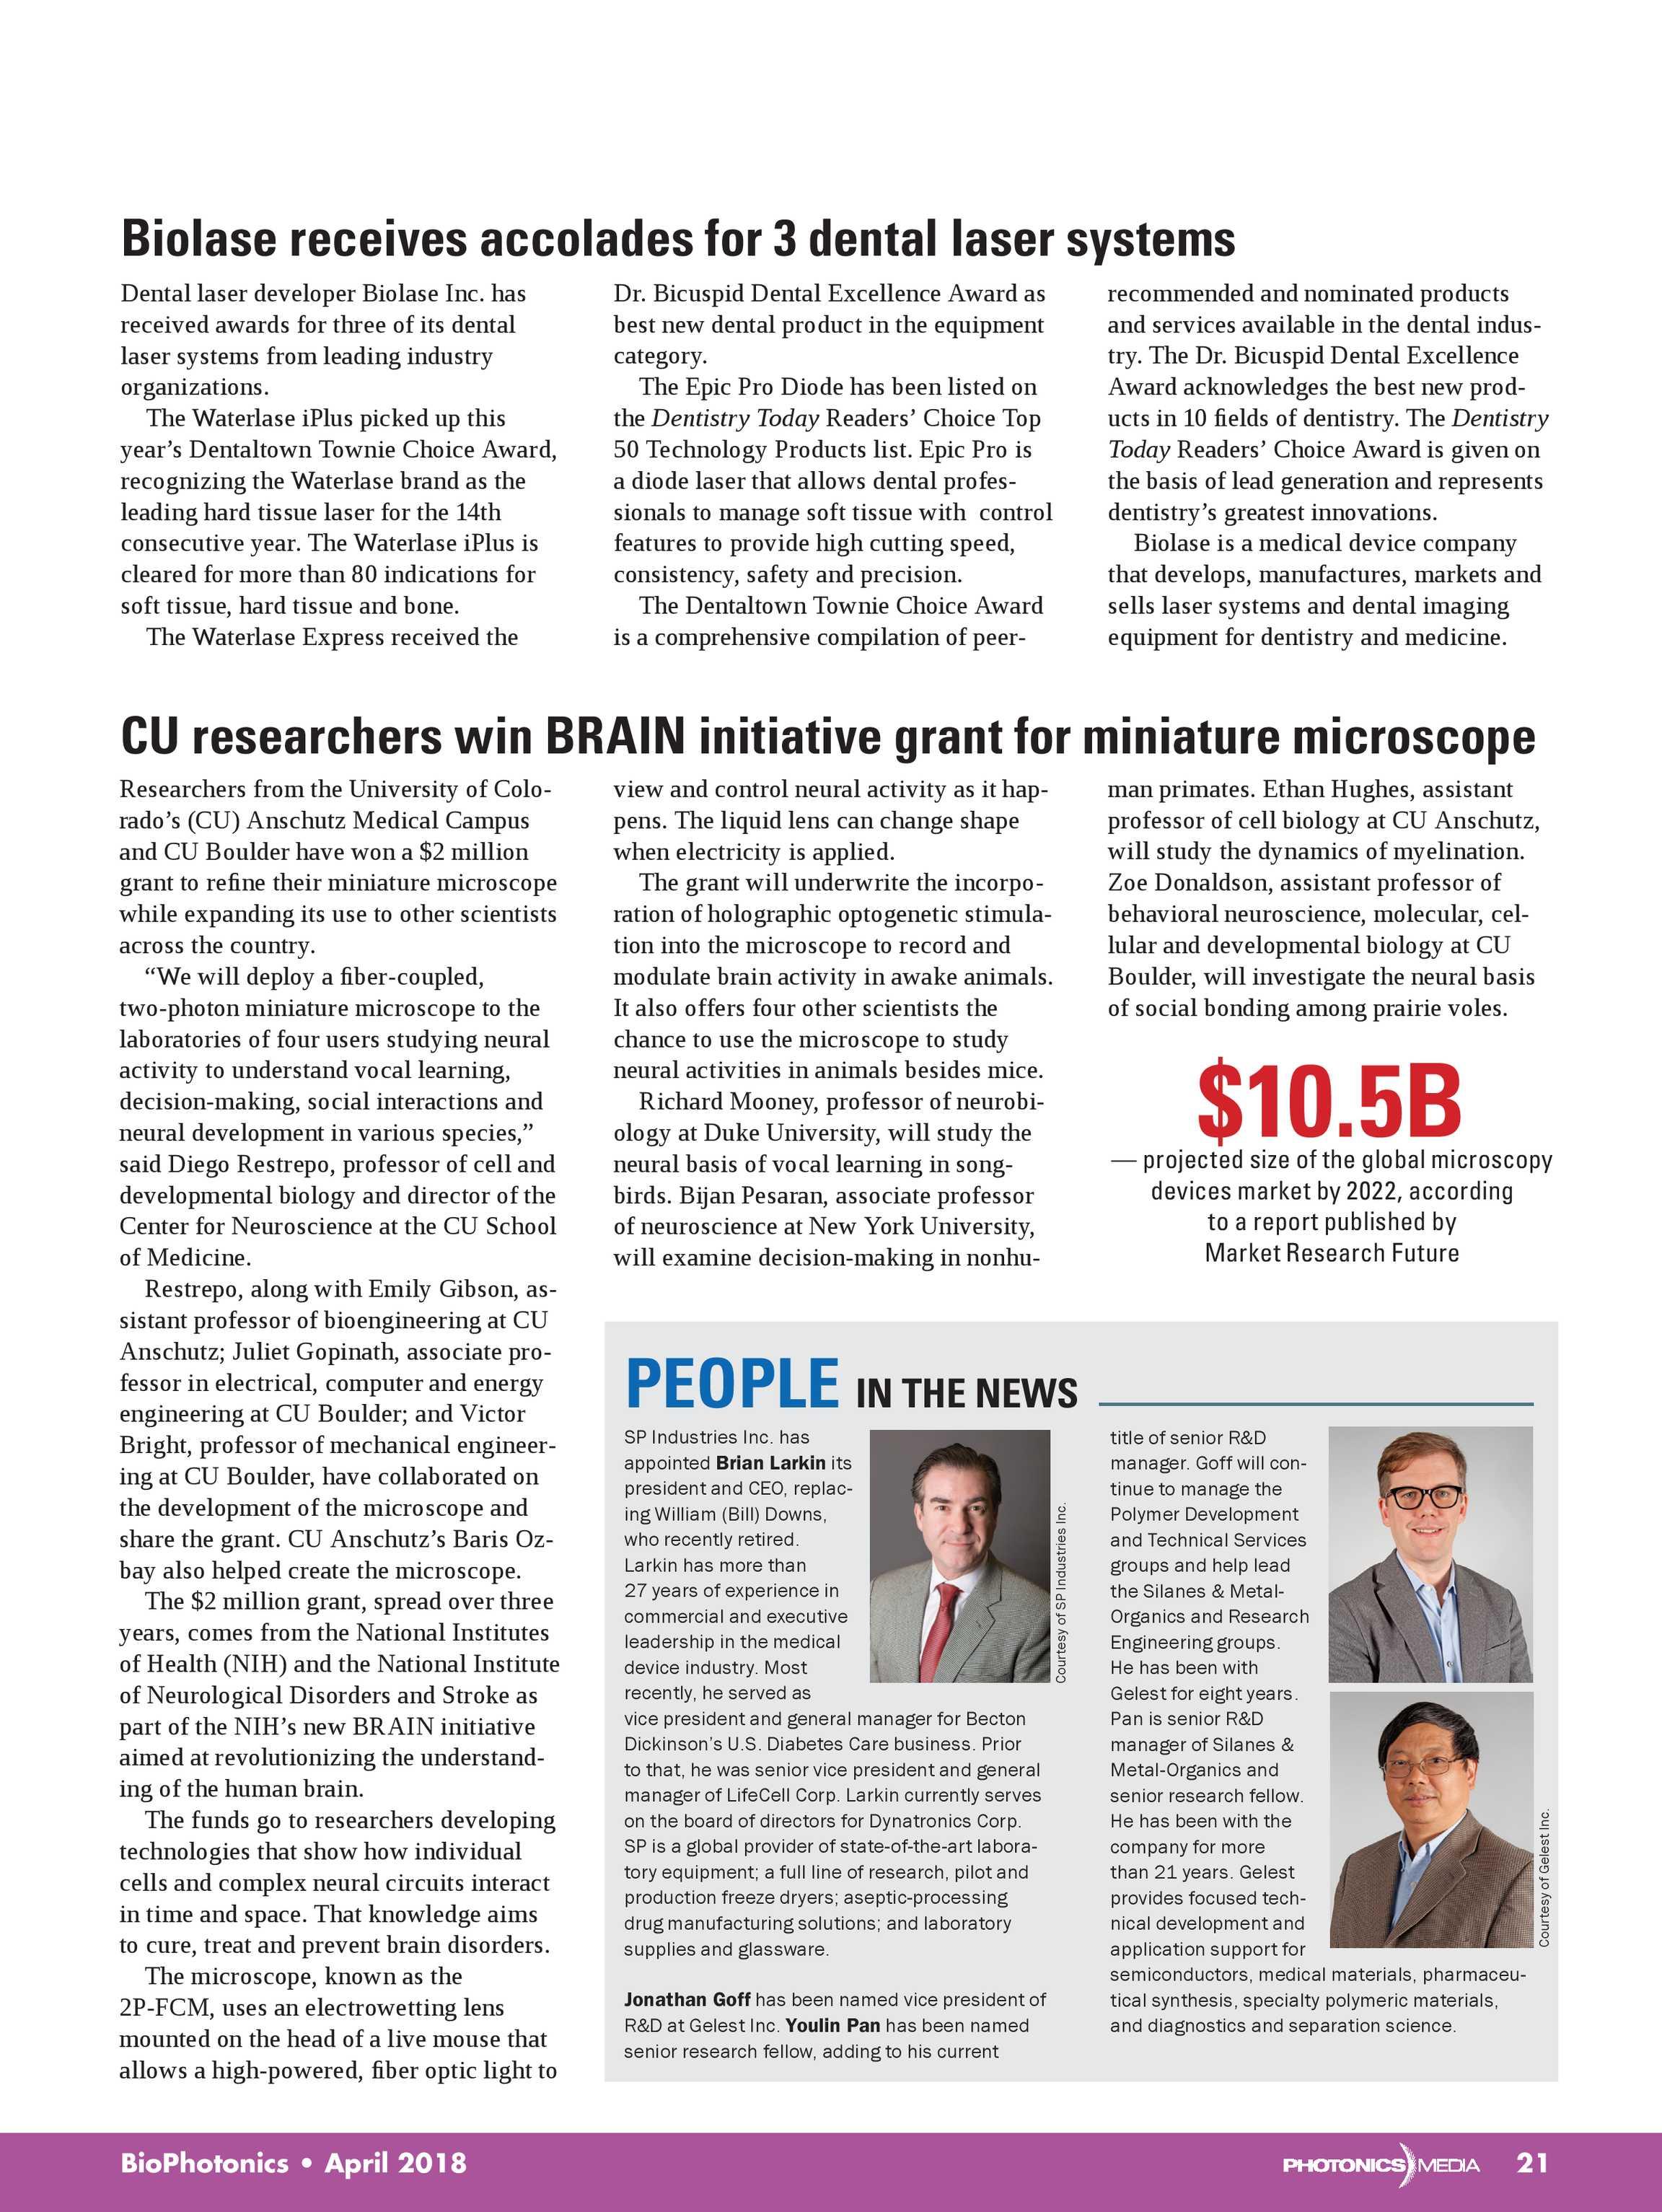 Bio Photonics - April 2018 - page Cover